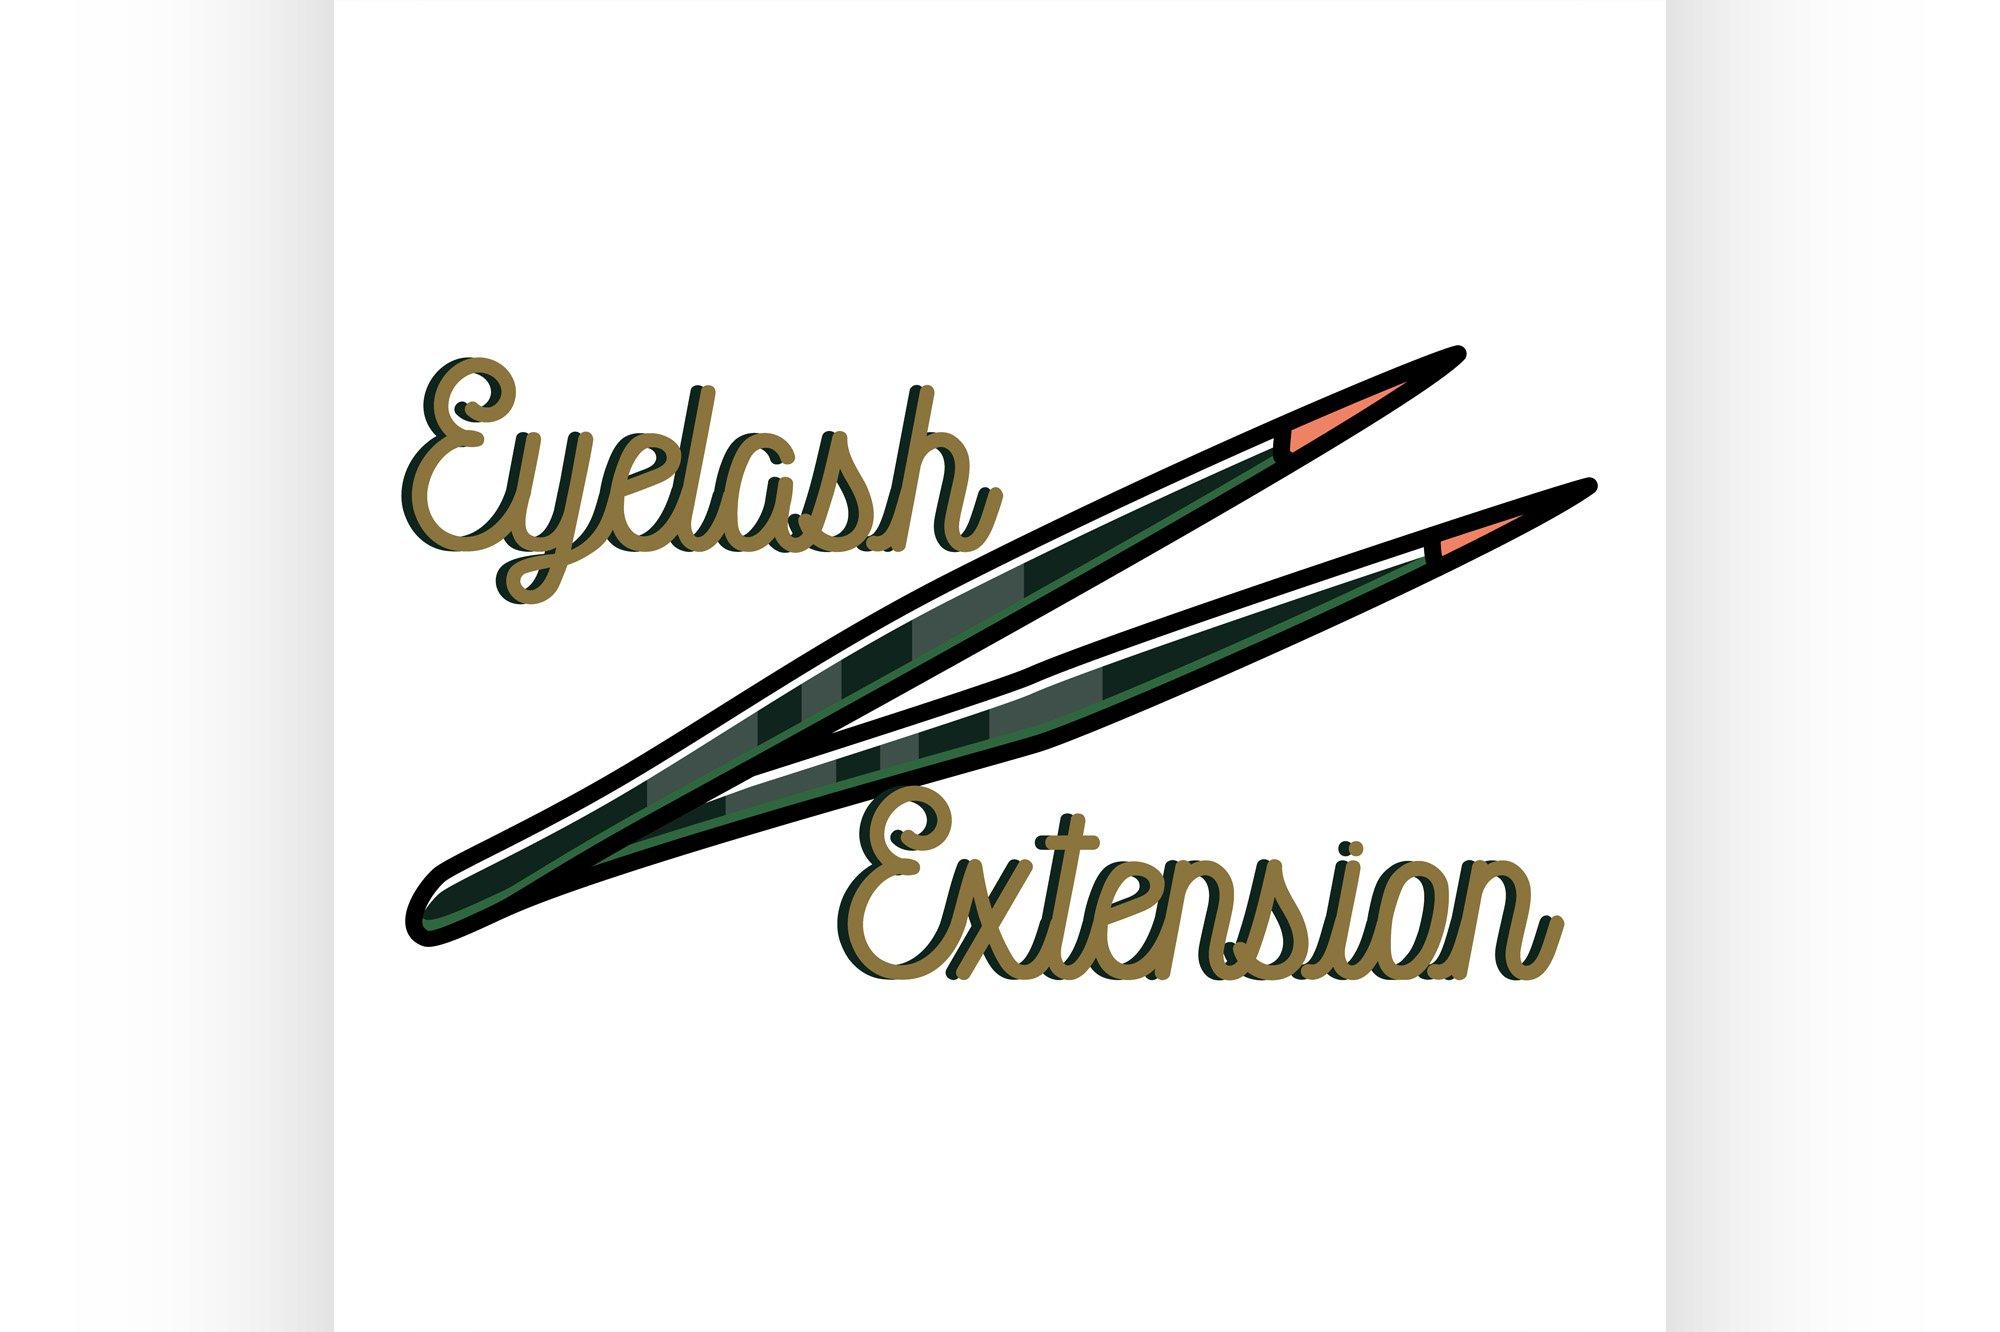 Color vintage eyelash extension emblem example image 1